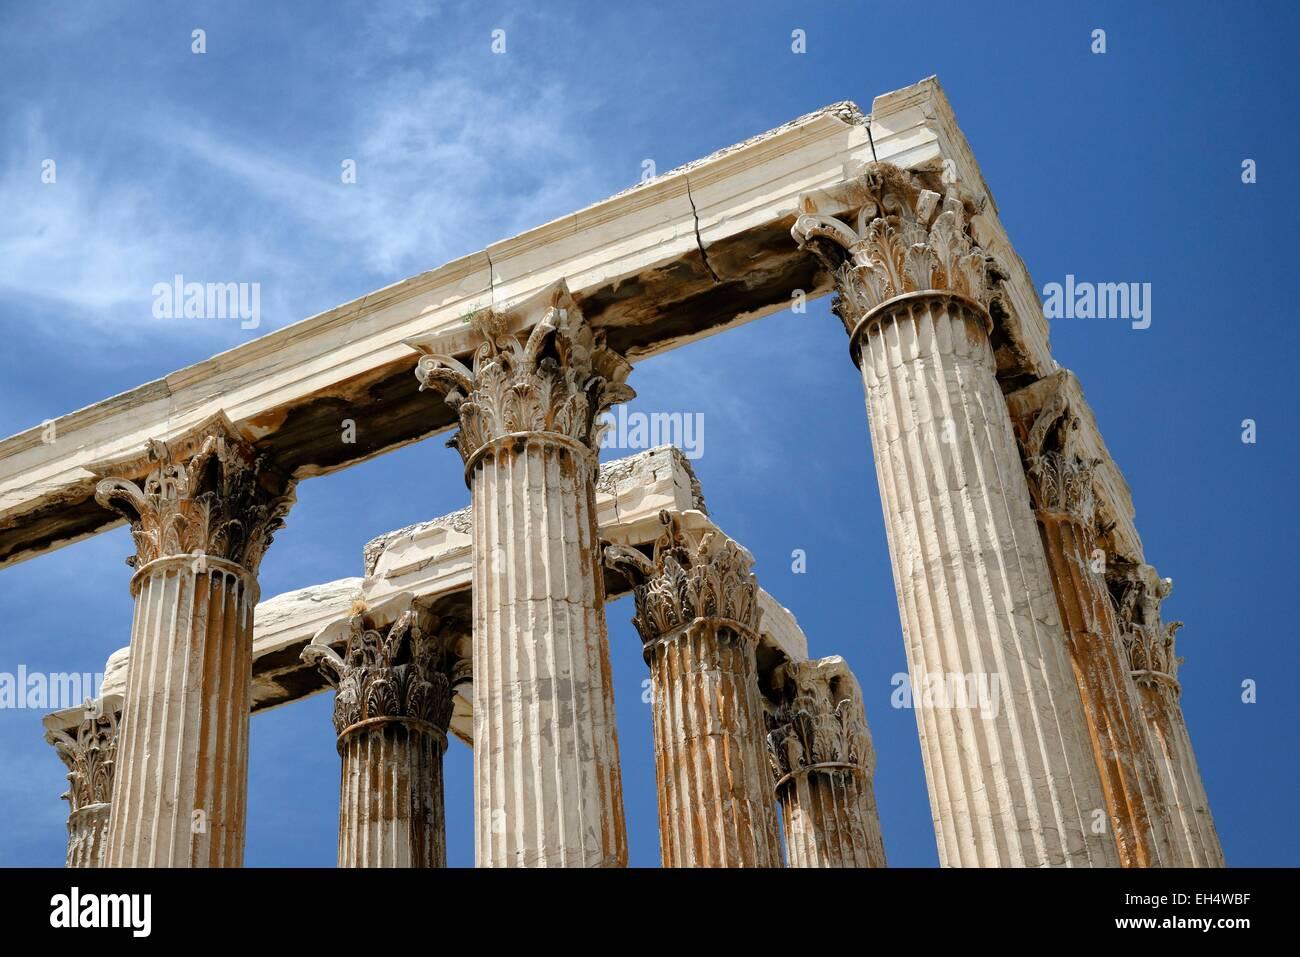 Greece, Attica, Athens, Corinthian columns of the temple of Olympian Zeus - Stock Image